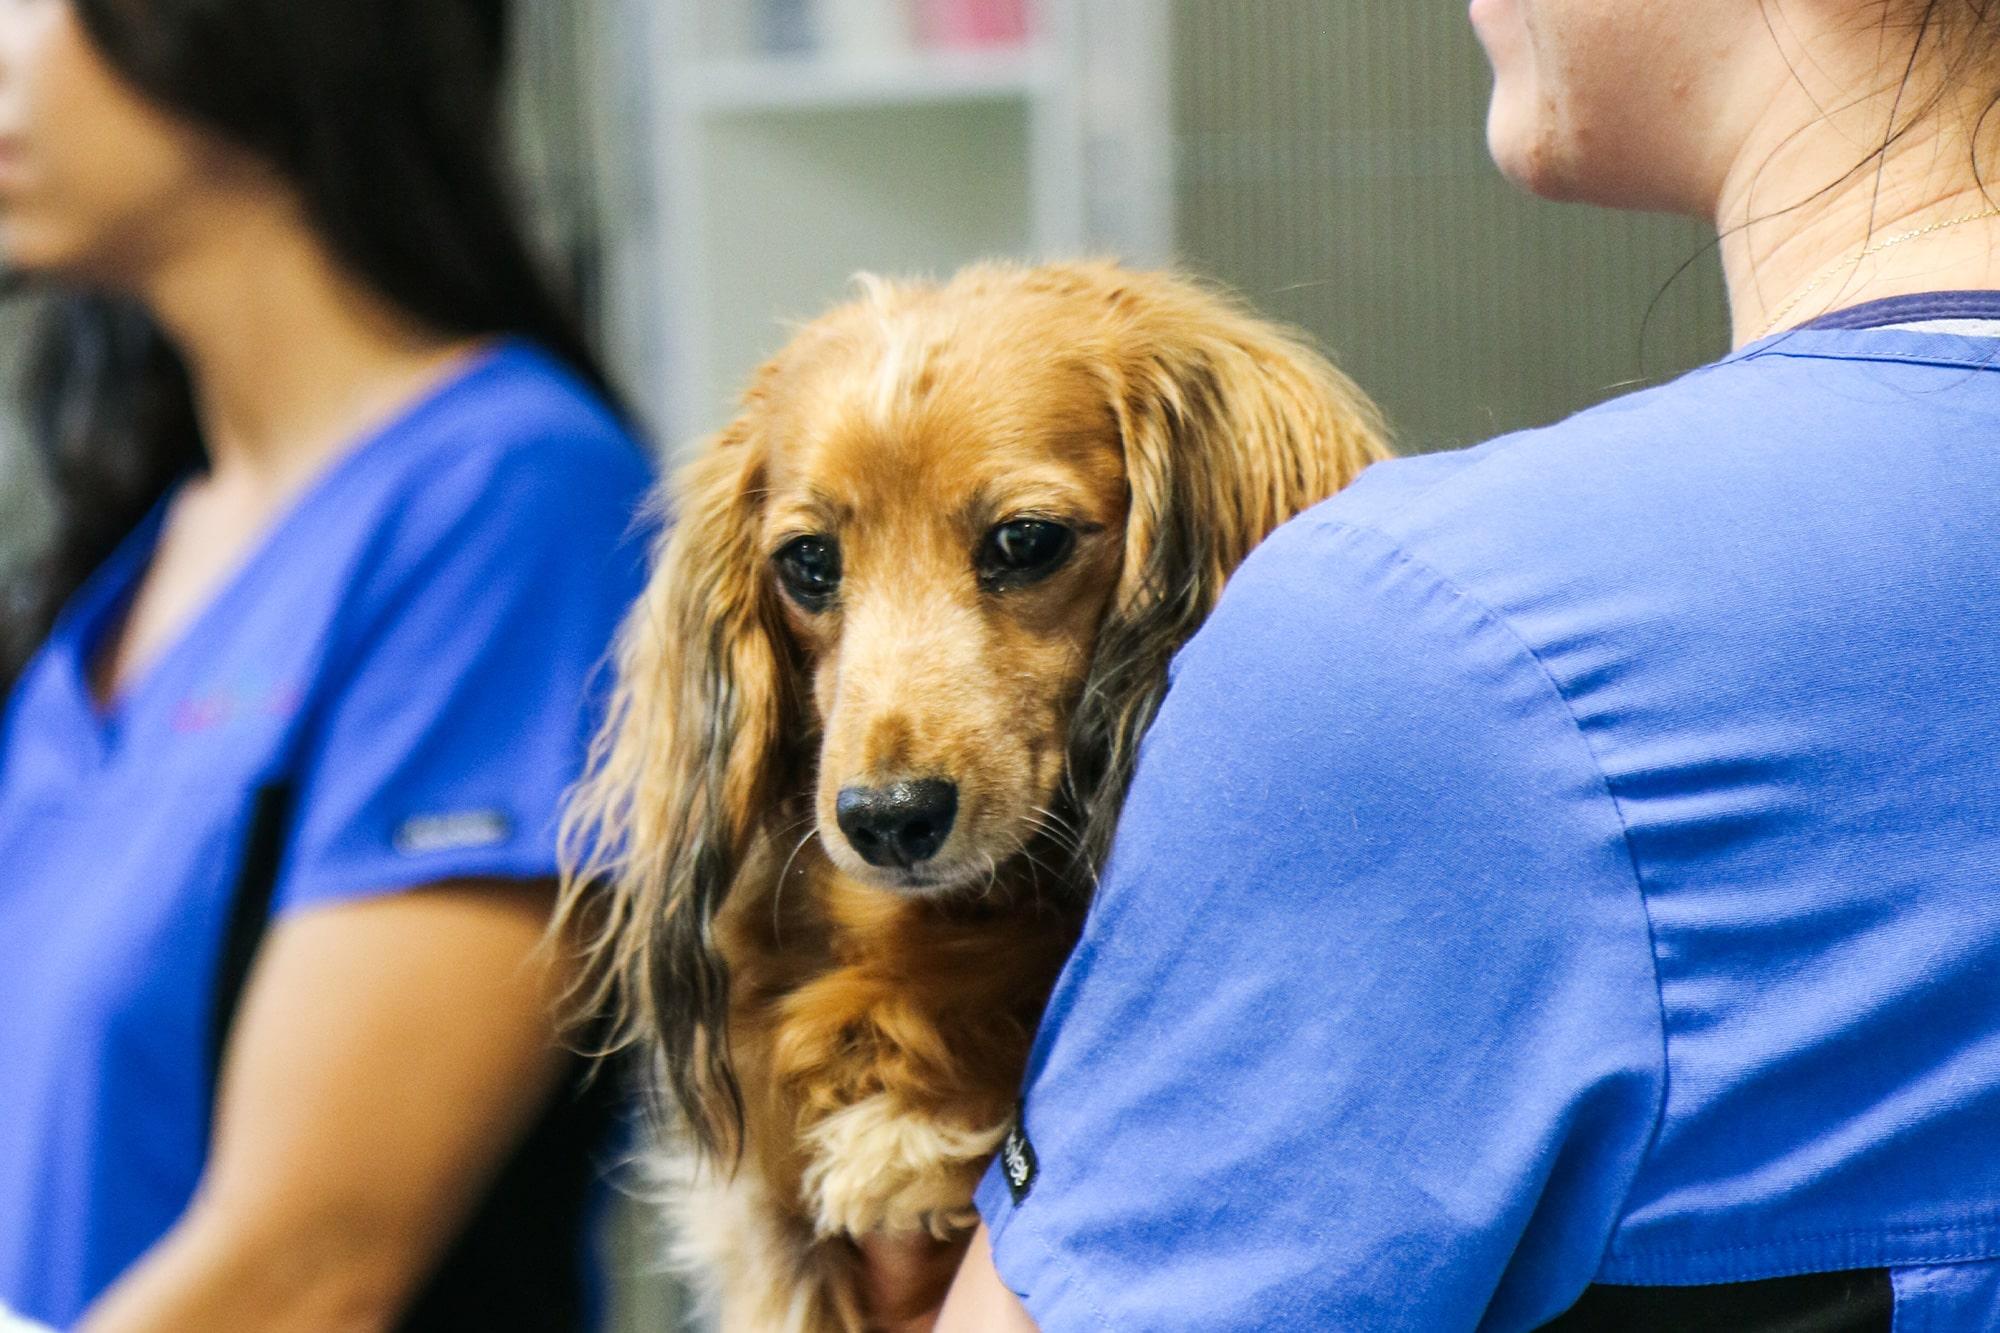 Brown dachshund at Animal Emergency Service Carrara on the arm of a nurse